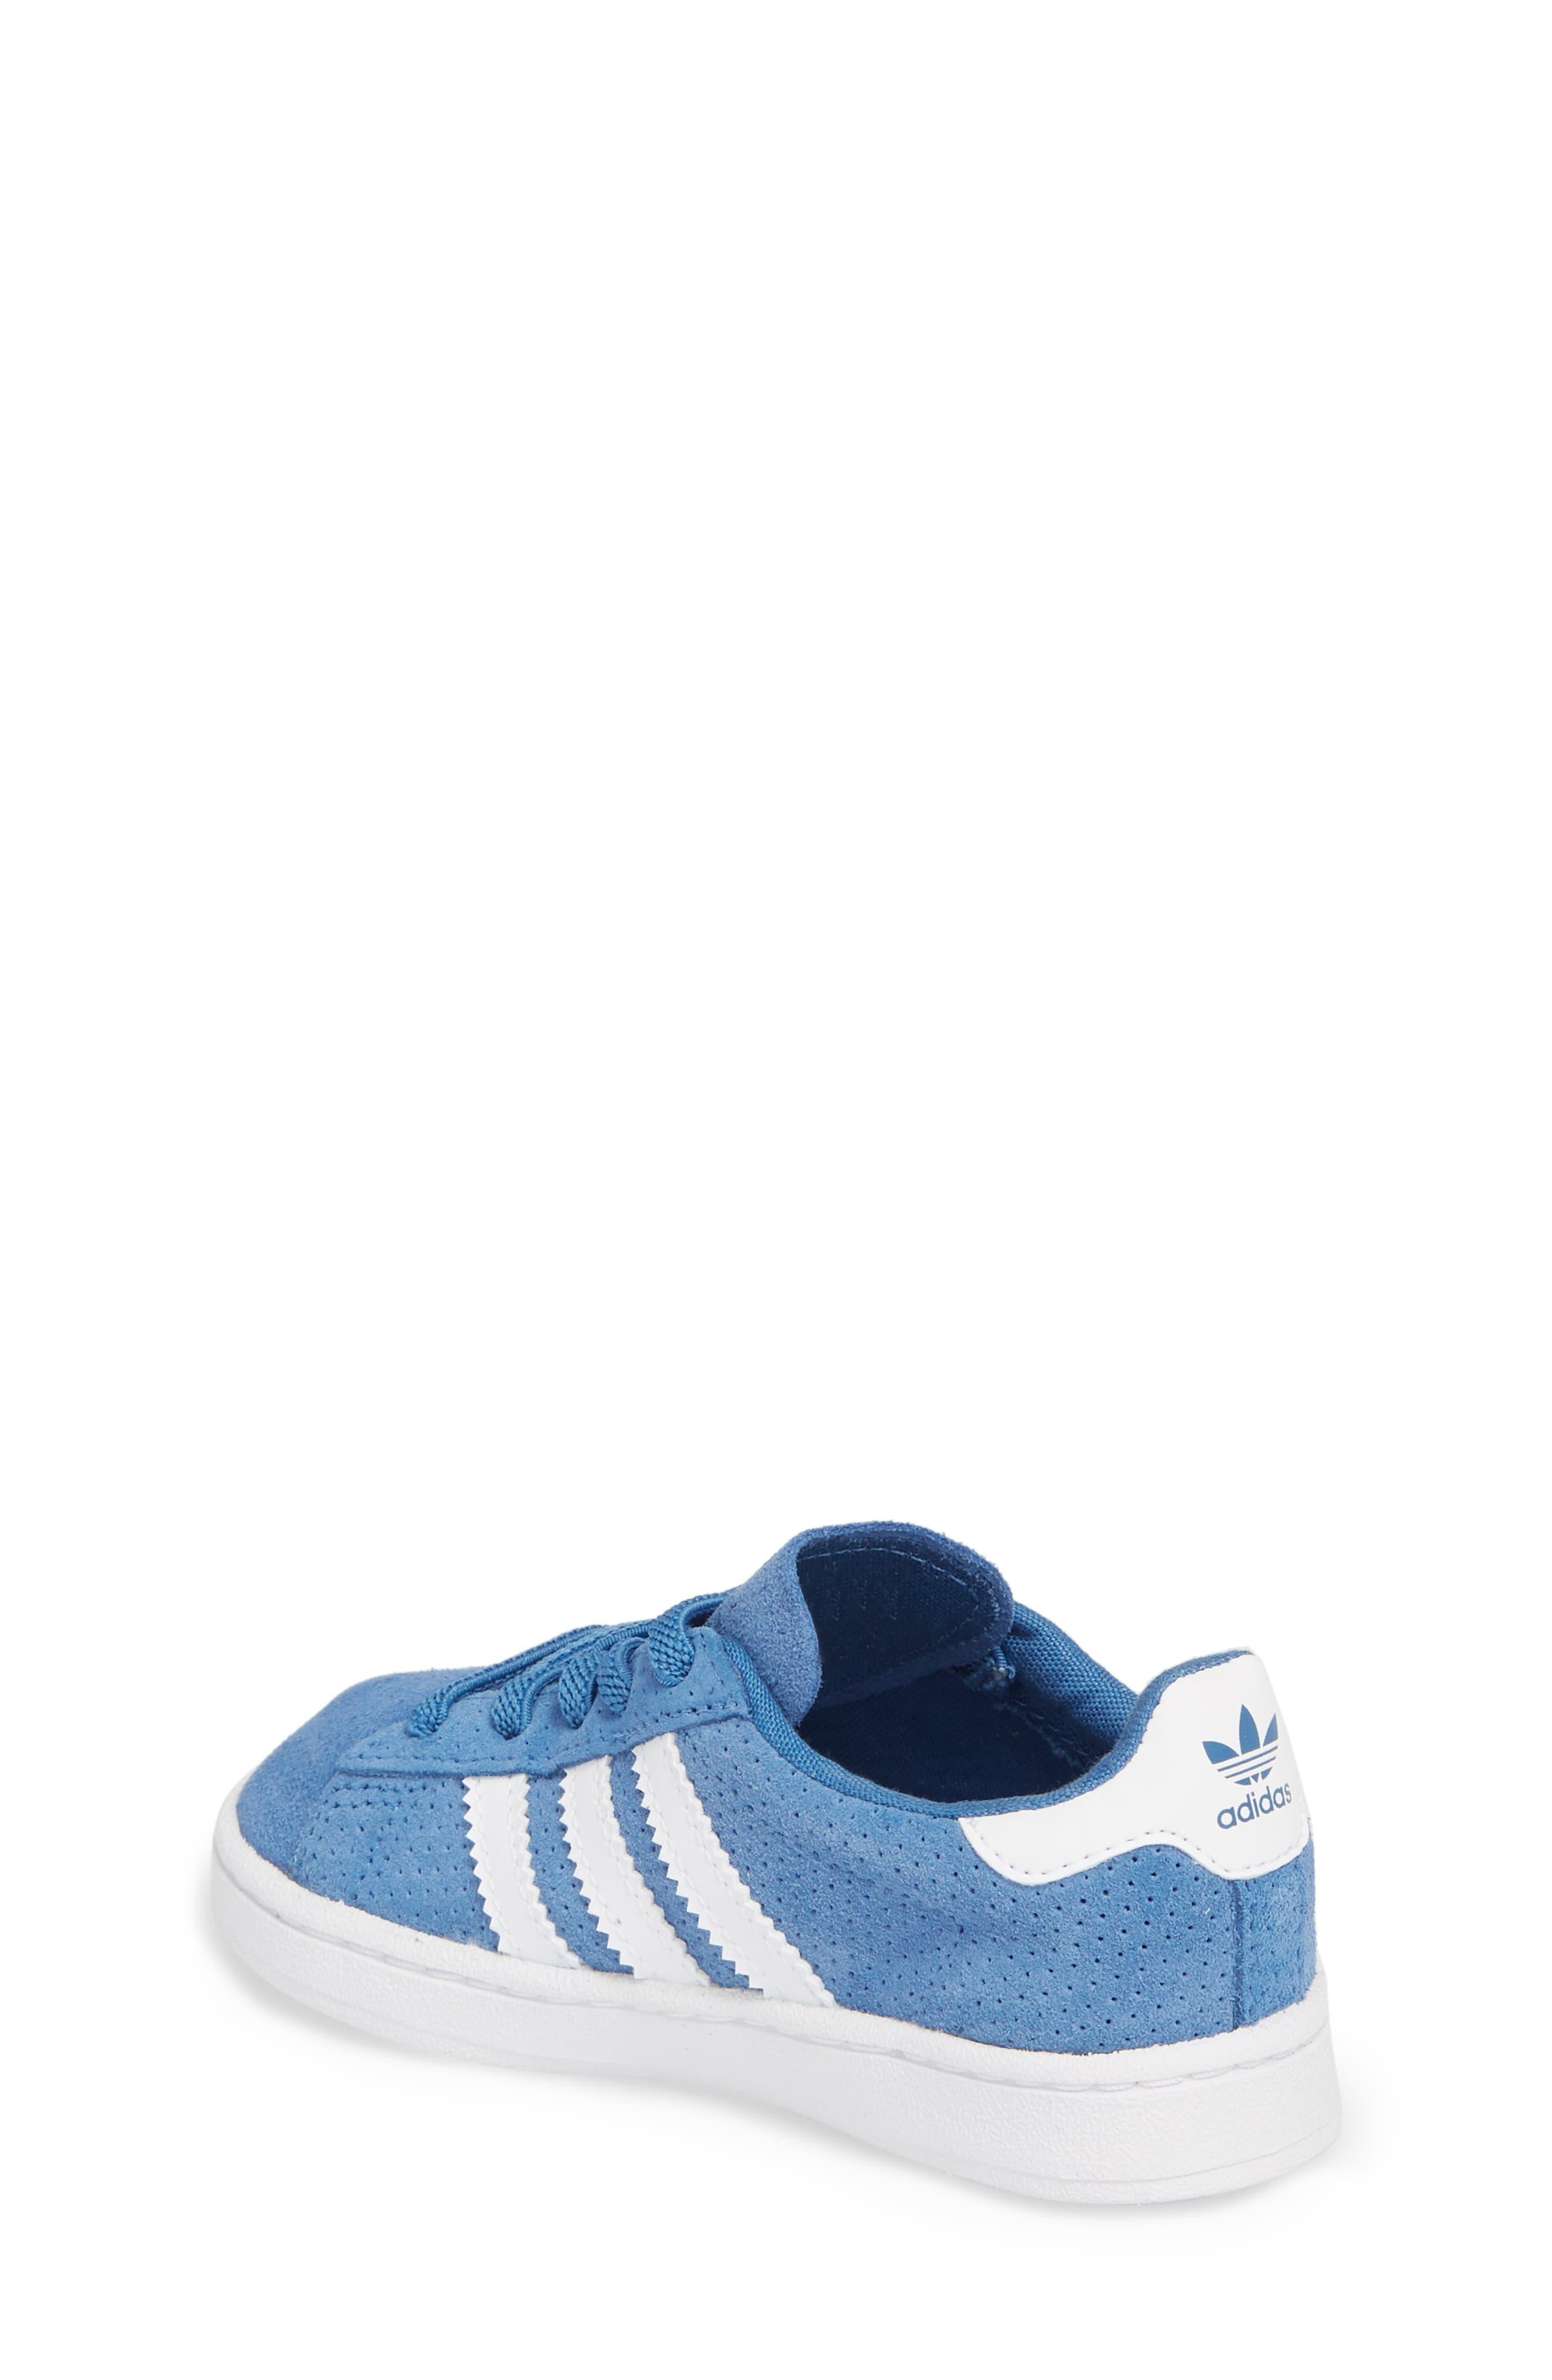 Campus J Sneaker,                             Alternate thumbnail 2, color,                             Trace Royal / White / White